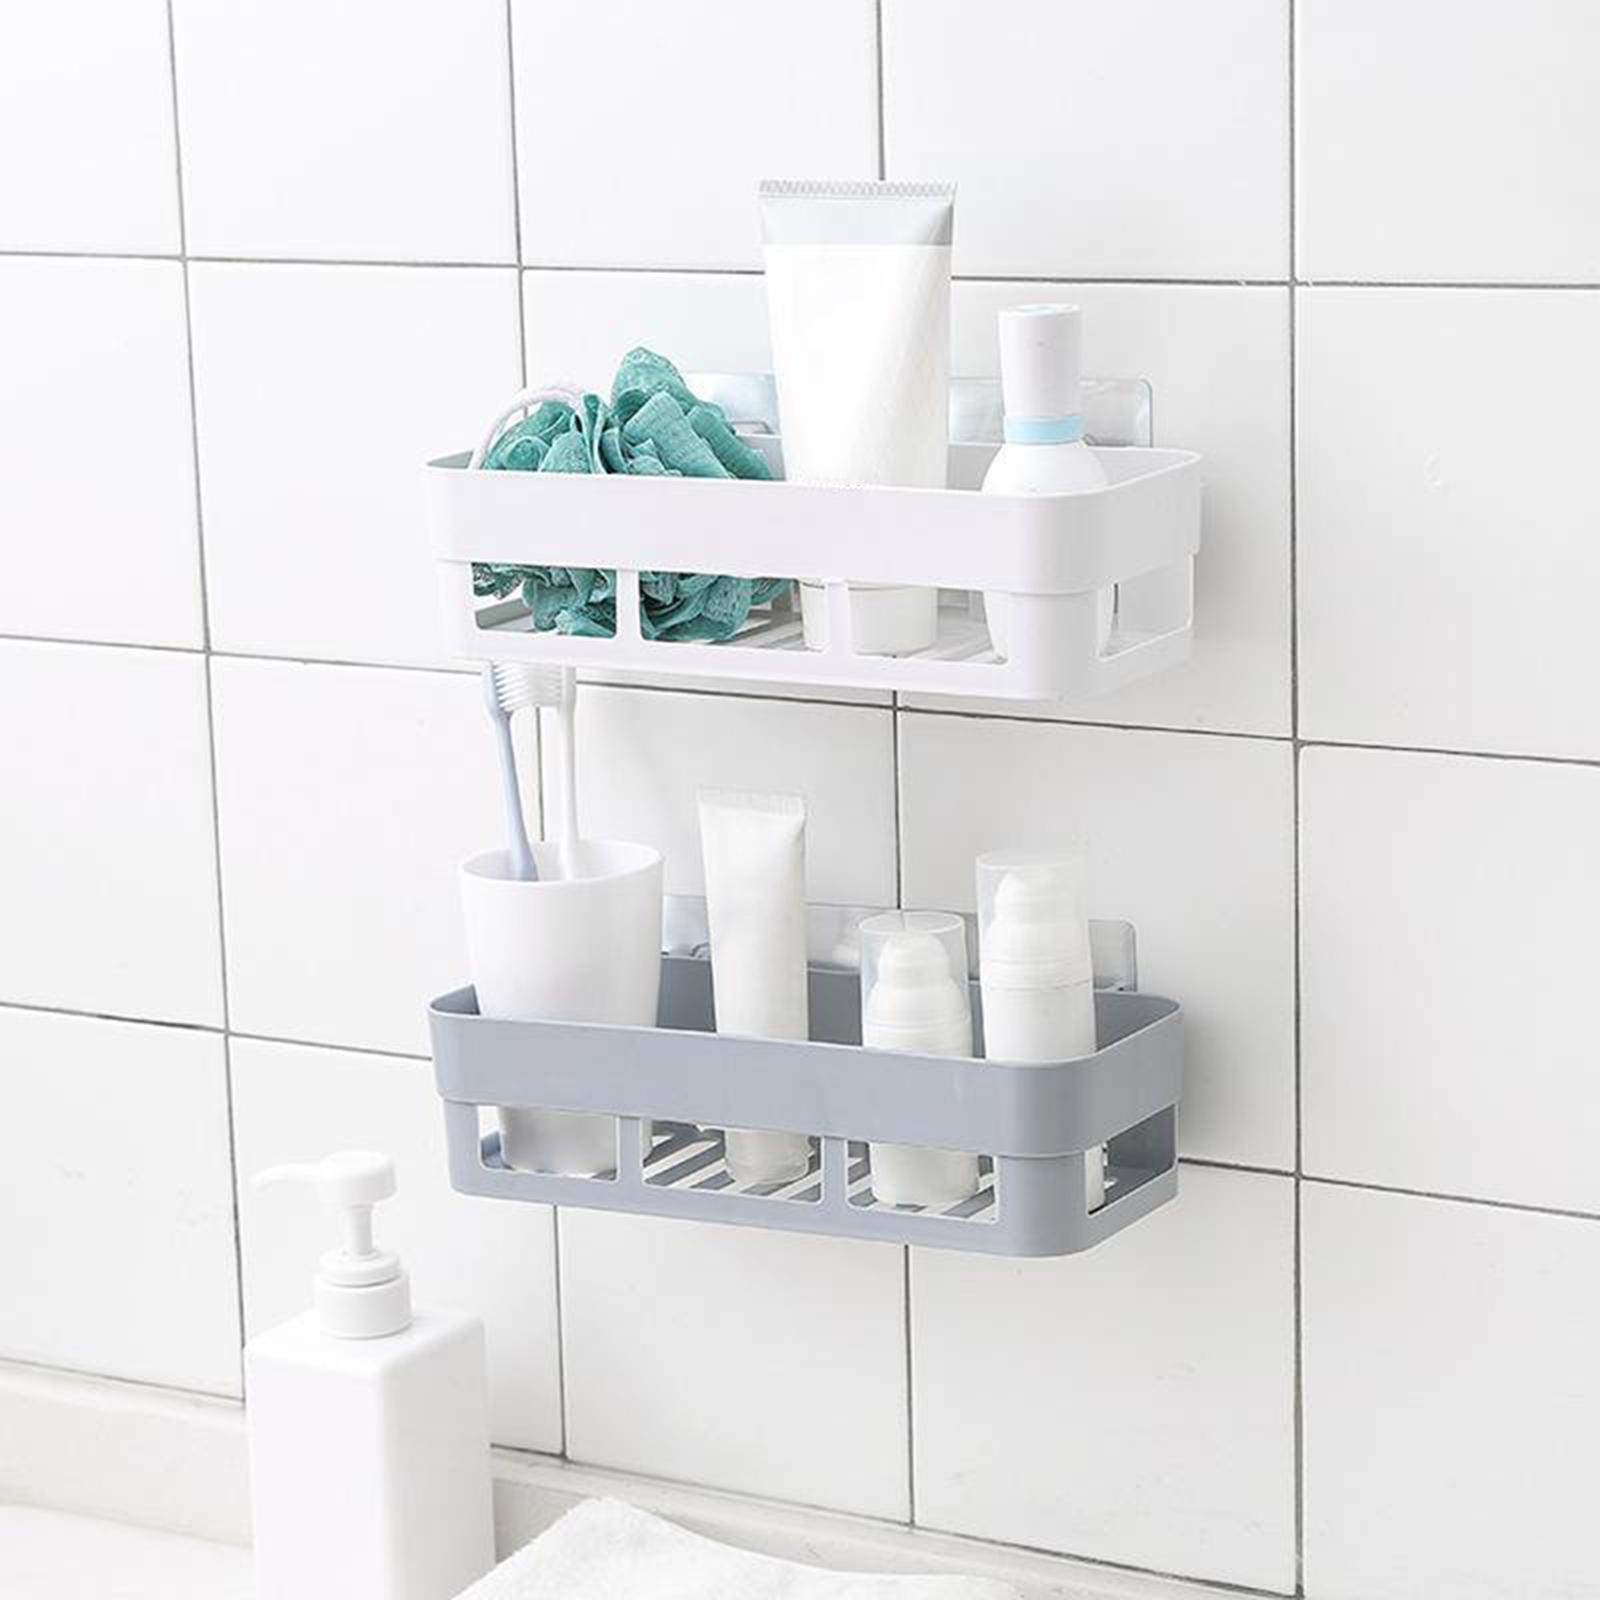 thumbnail 17 - Wall-Suction-Bathroom-Shelf-Shower-Caddy-Wall-Mount-Storage-Rack-Organizer